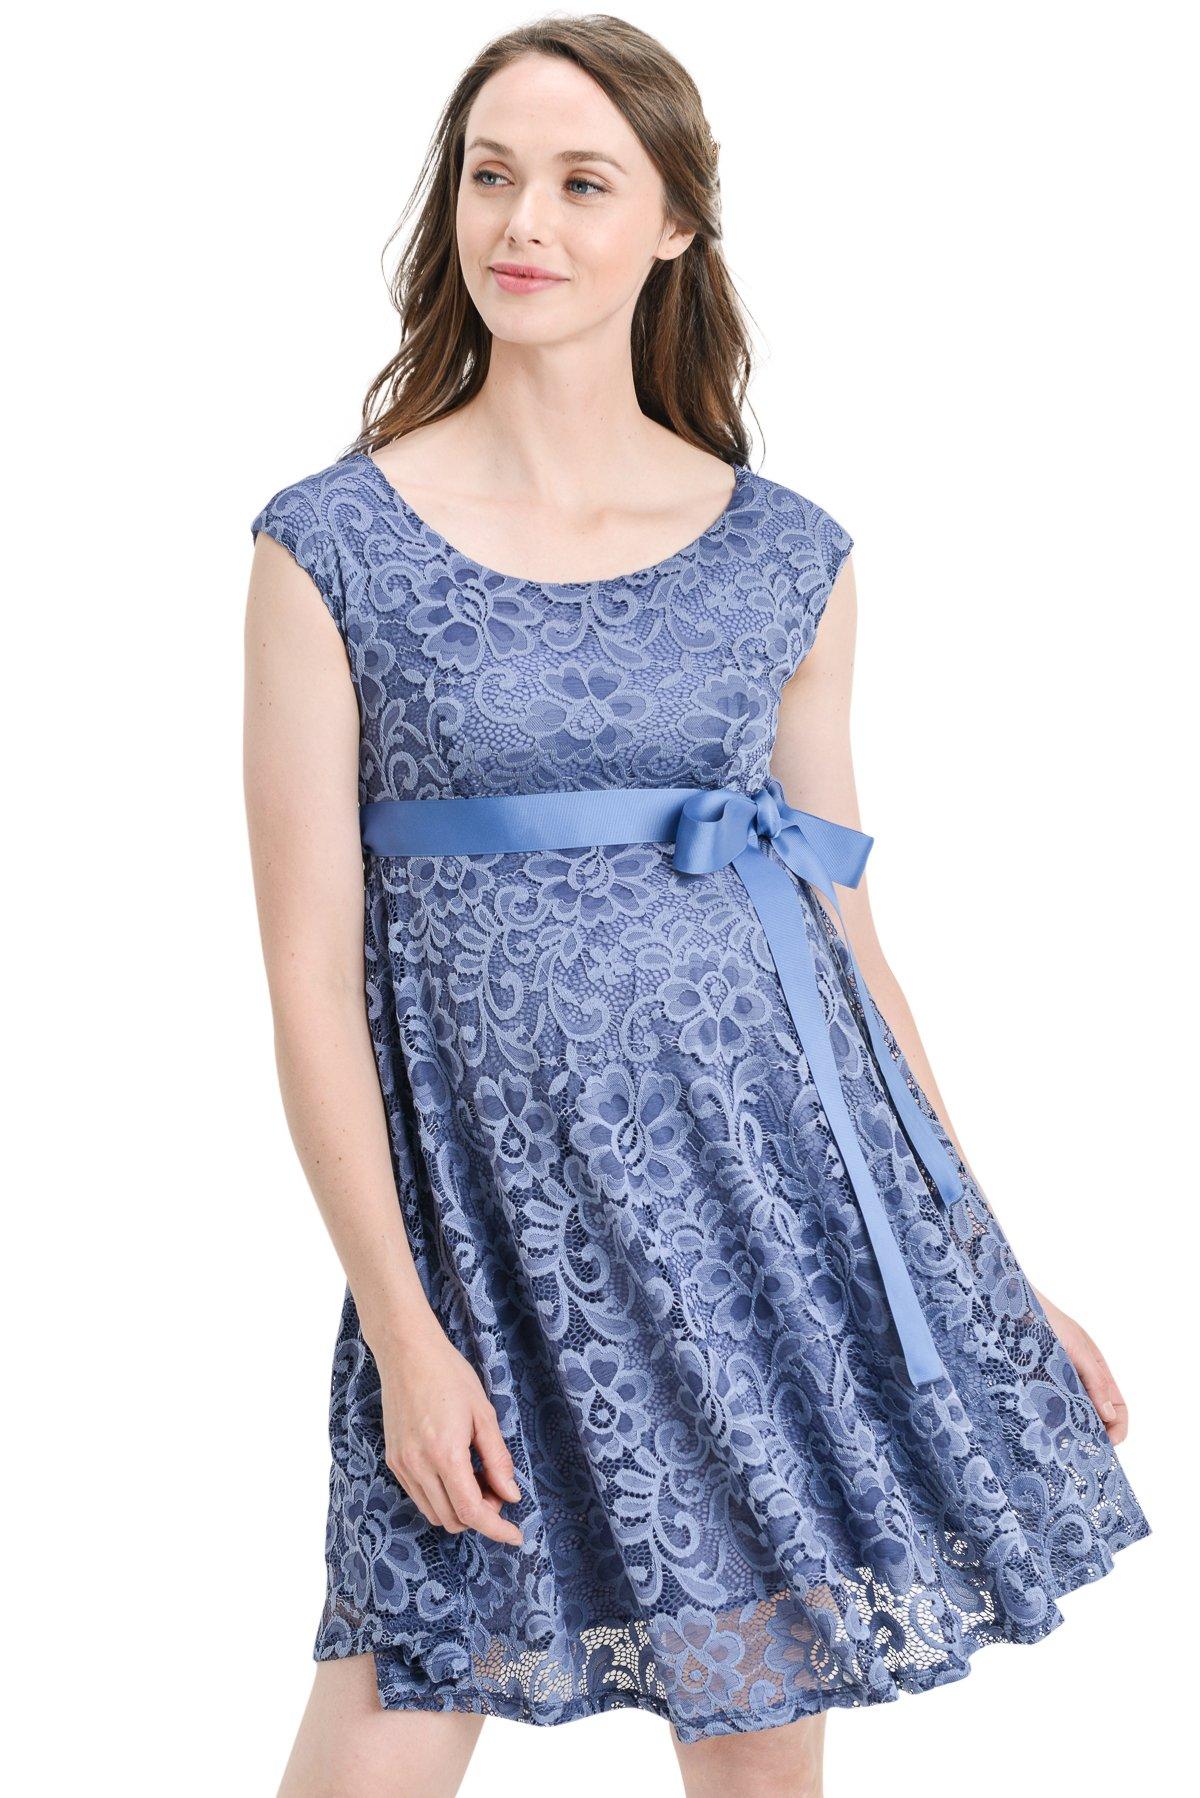 Hello MIZ Floral Lace Baby Shower Party Cocktail Dress with Satin Waist Maternity Dress (Medium, Denim)